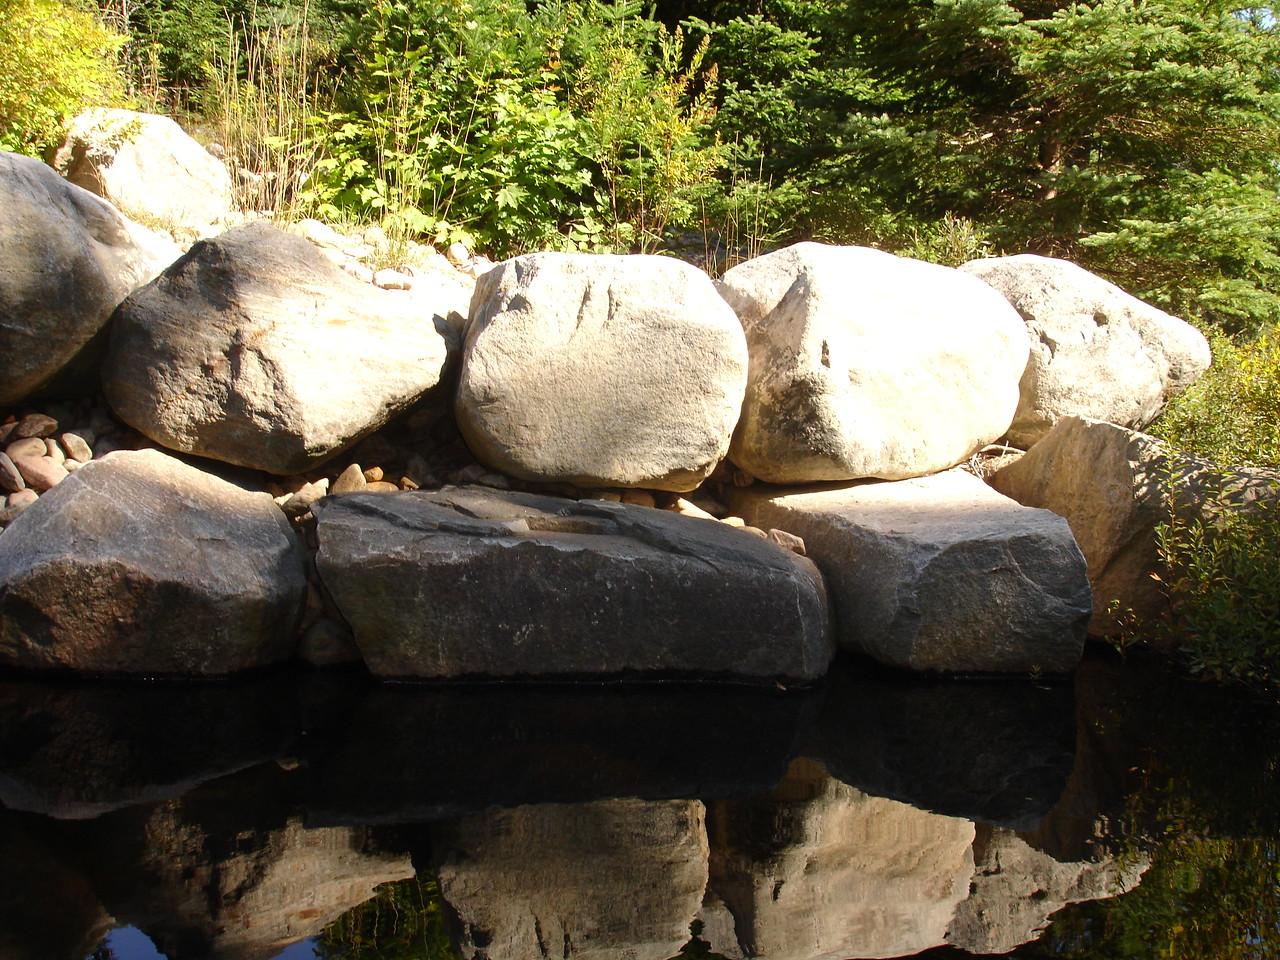 Foundation of an old logging road bridge.